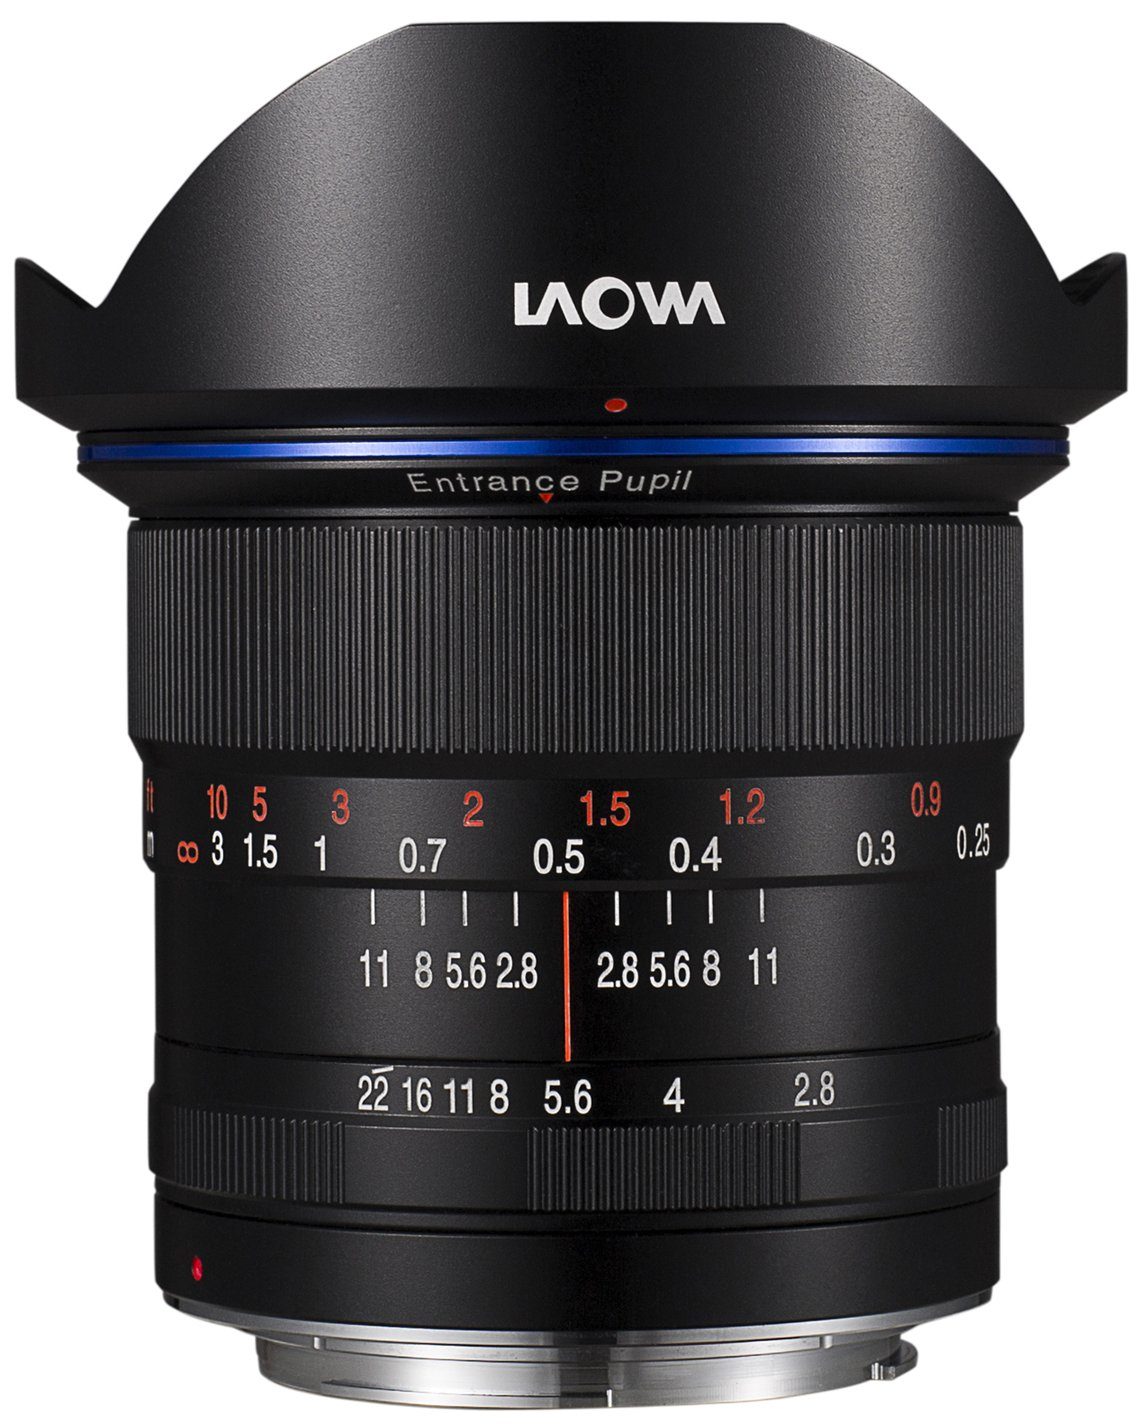 Venus LAOWA 12 mm F / 2.8 zero-d ultra-wideangleレンズfor Canon EFカメラ   B01N6KZ61U